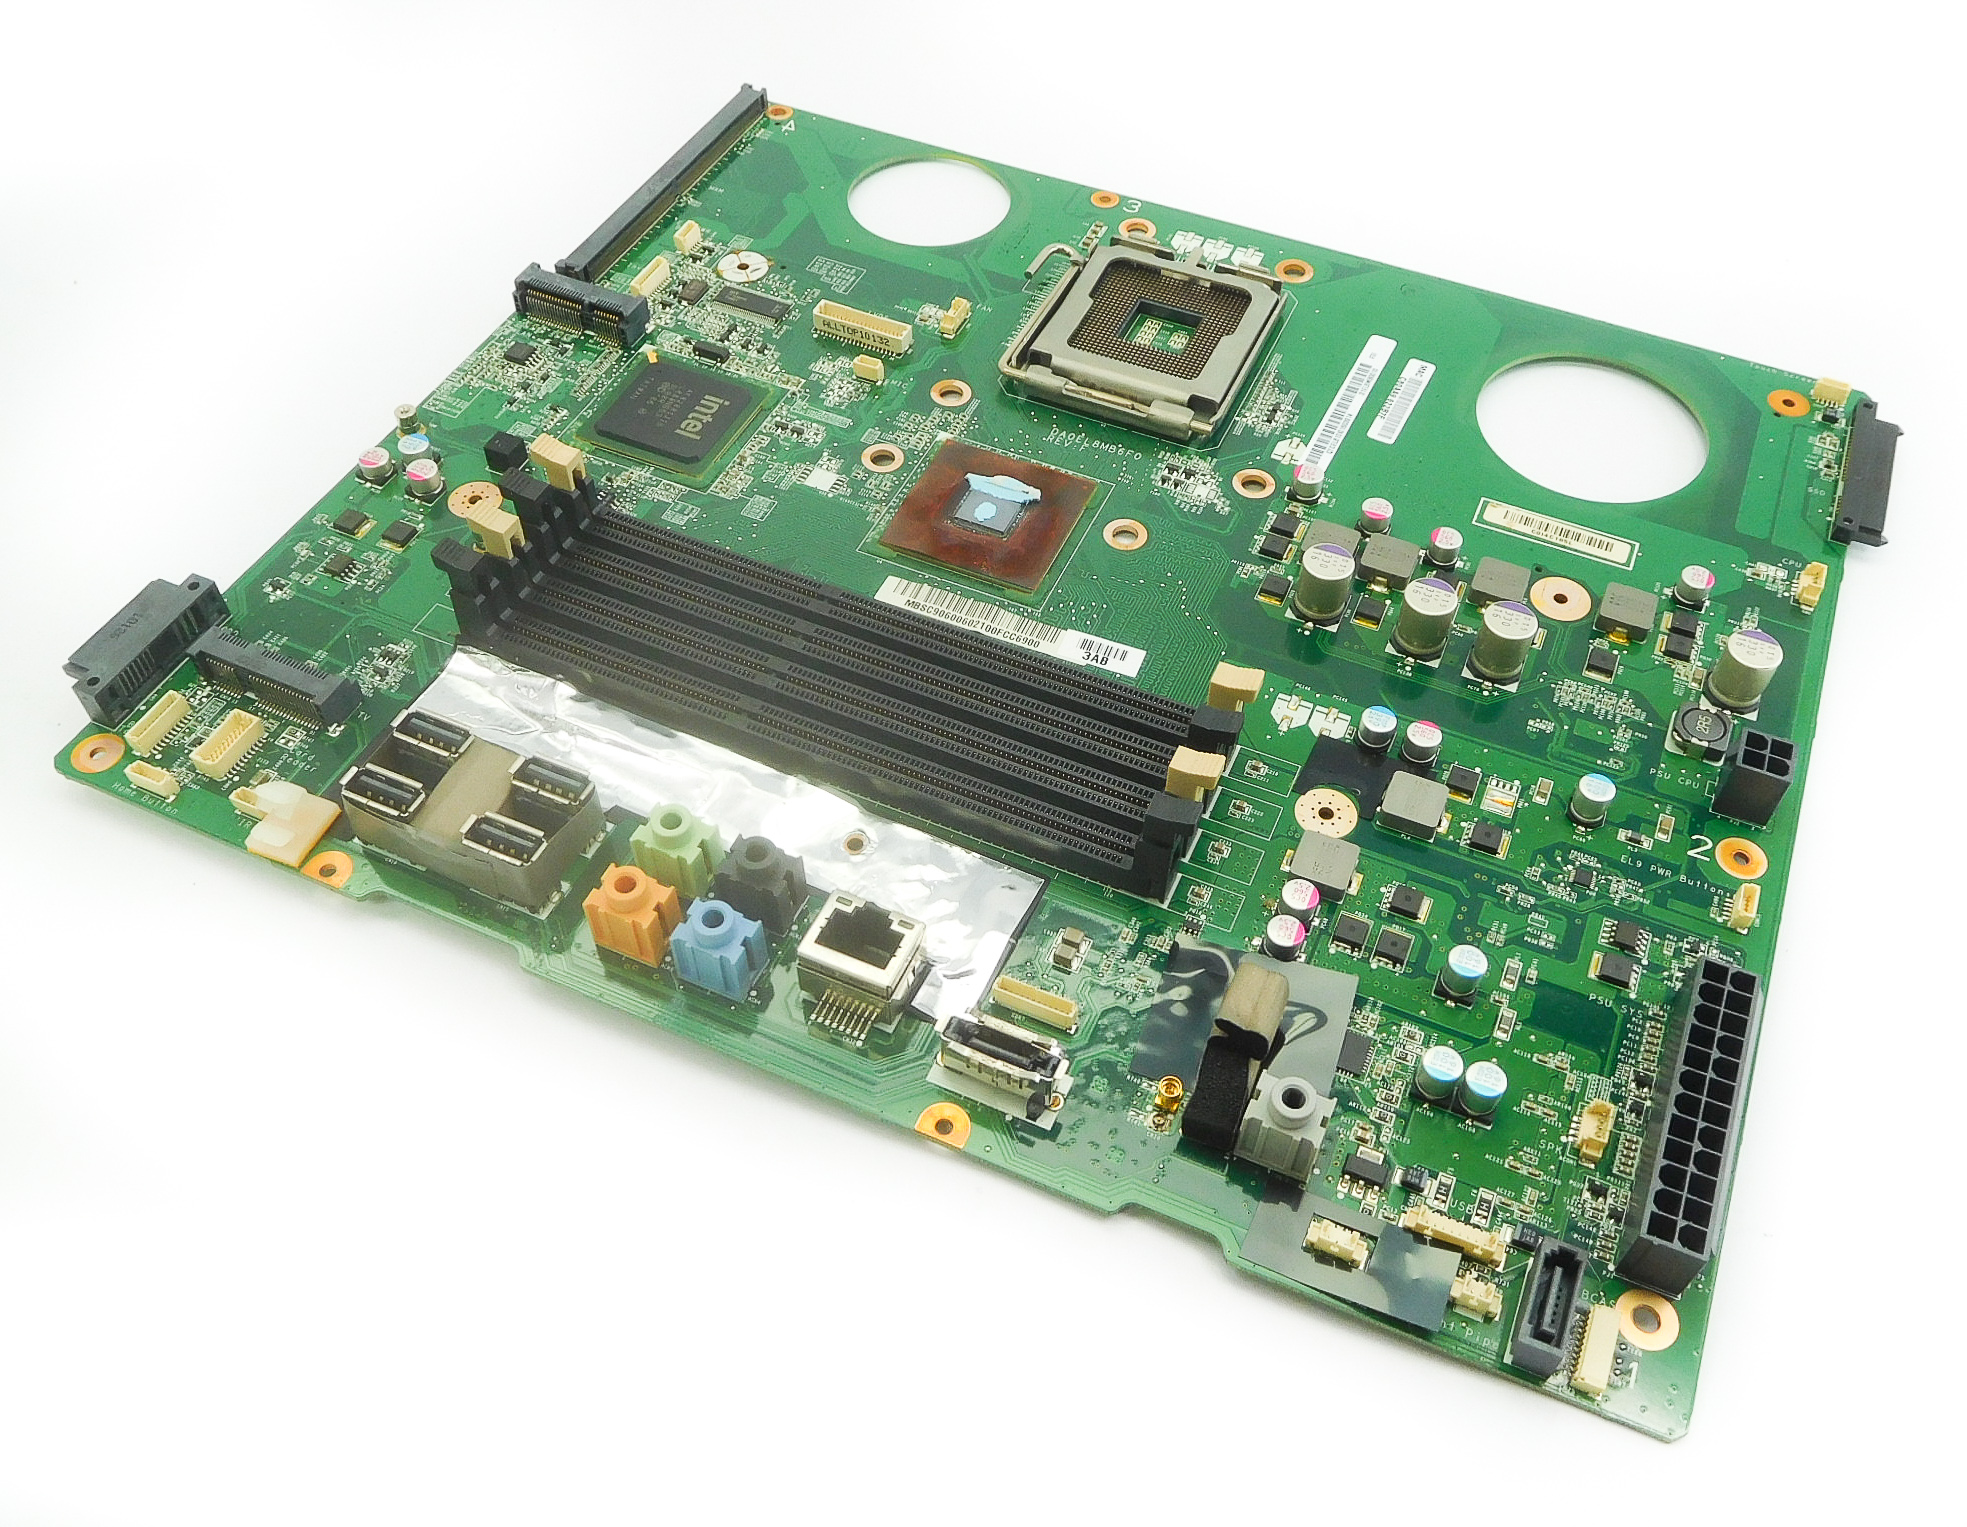 MB.SC906.006 Acer Aspire Z5610 AiO Motherboard DA0EL8MB6F0 Rev:F